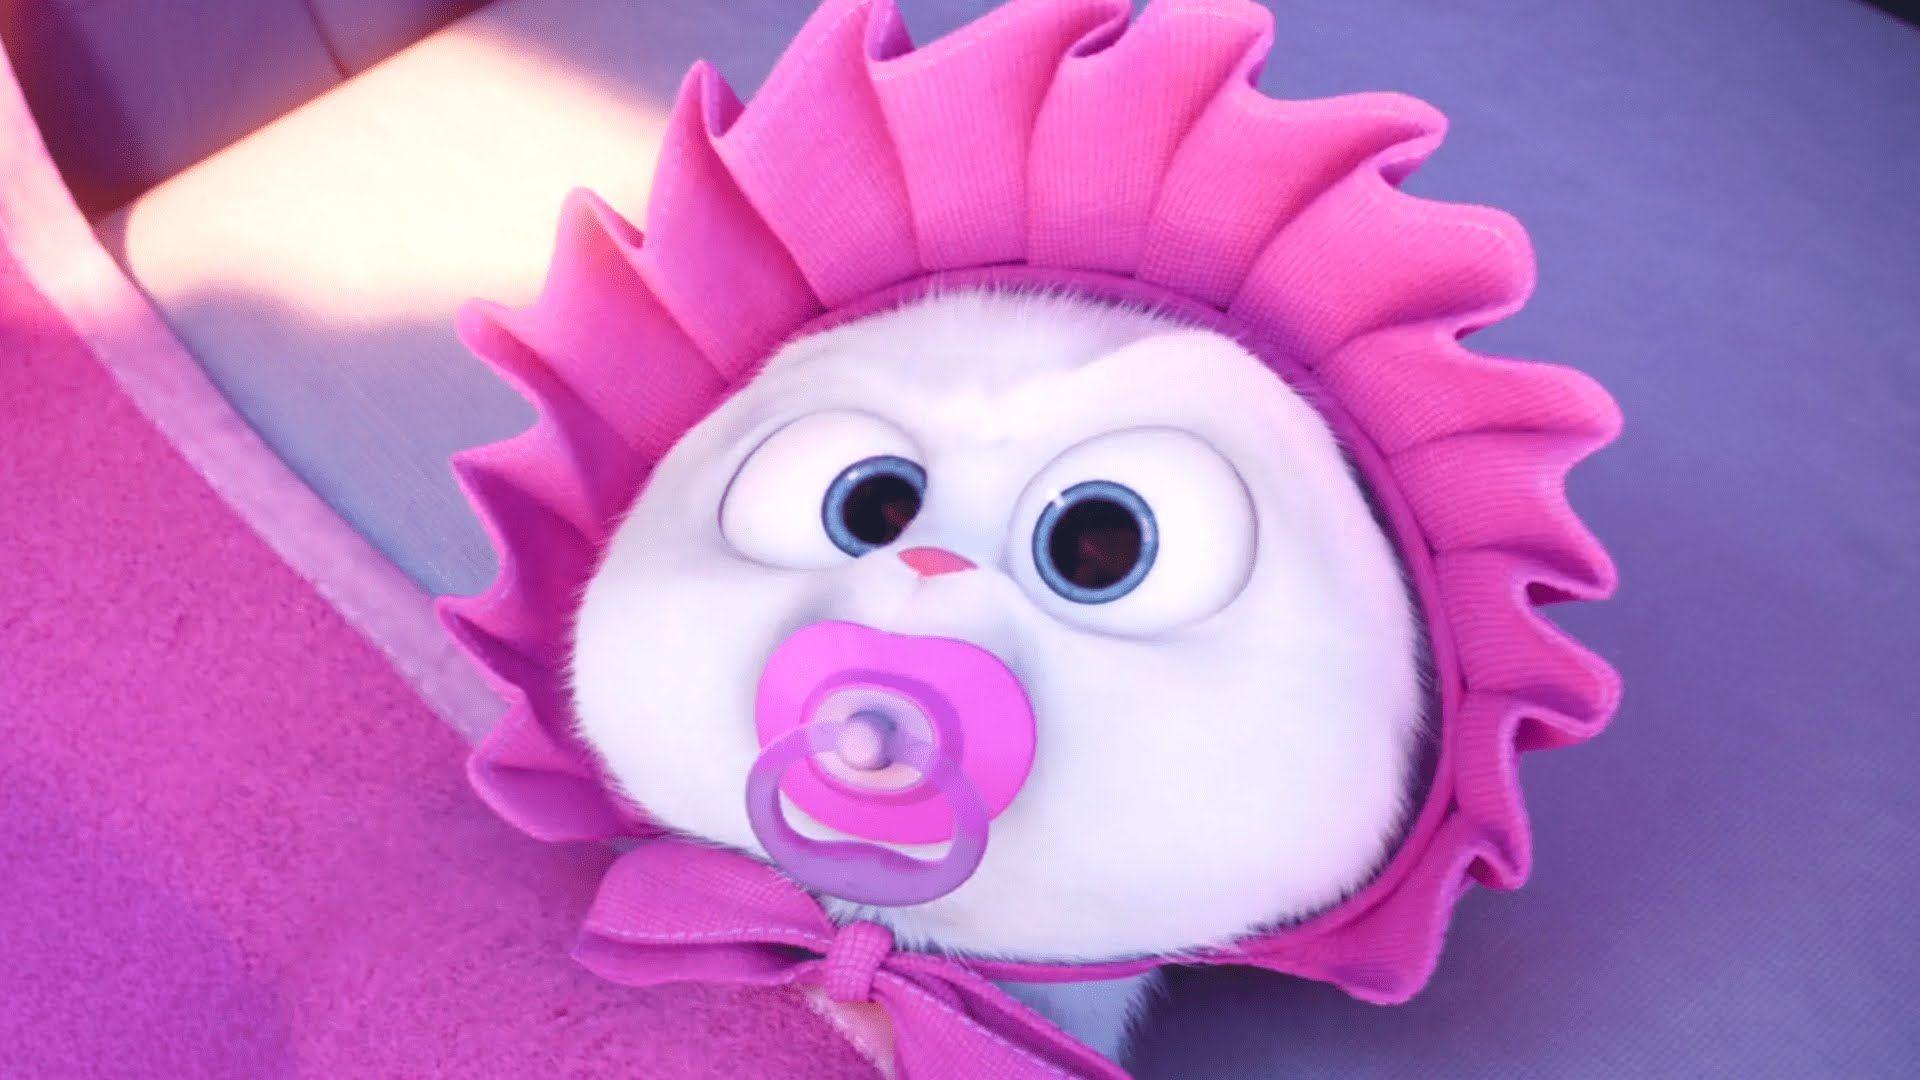 The Secret Life Of Pets Featurette Meet Snowball 2016 Animated Comedy Movie Hd Gambar Kelinci Hewan Kartun